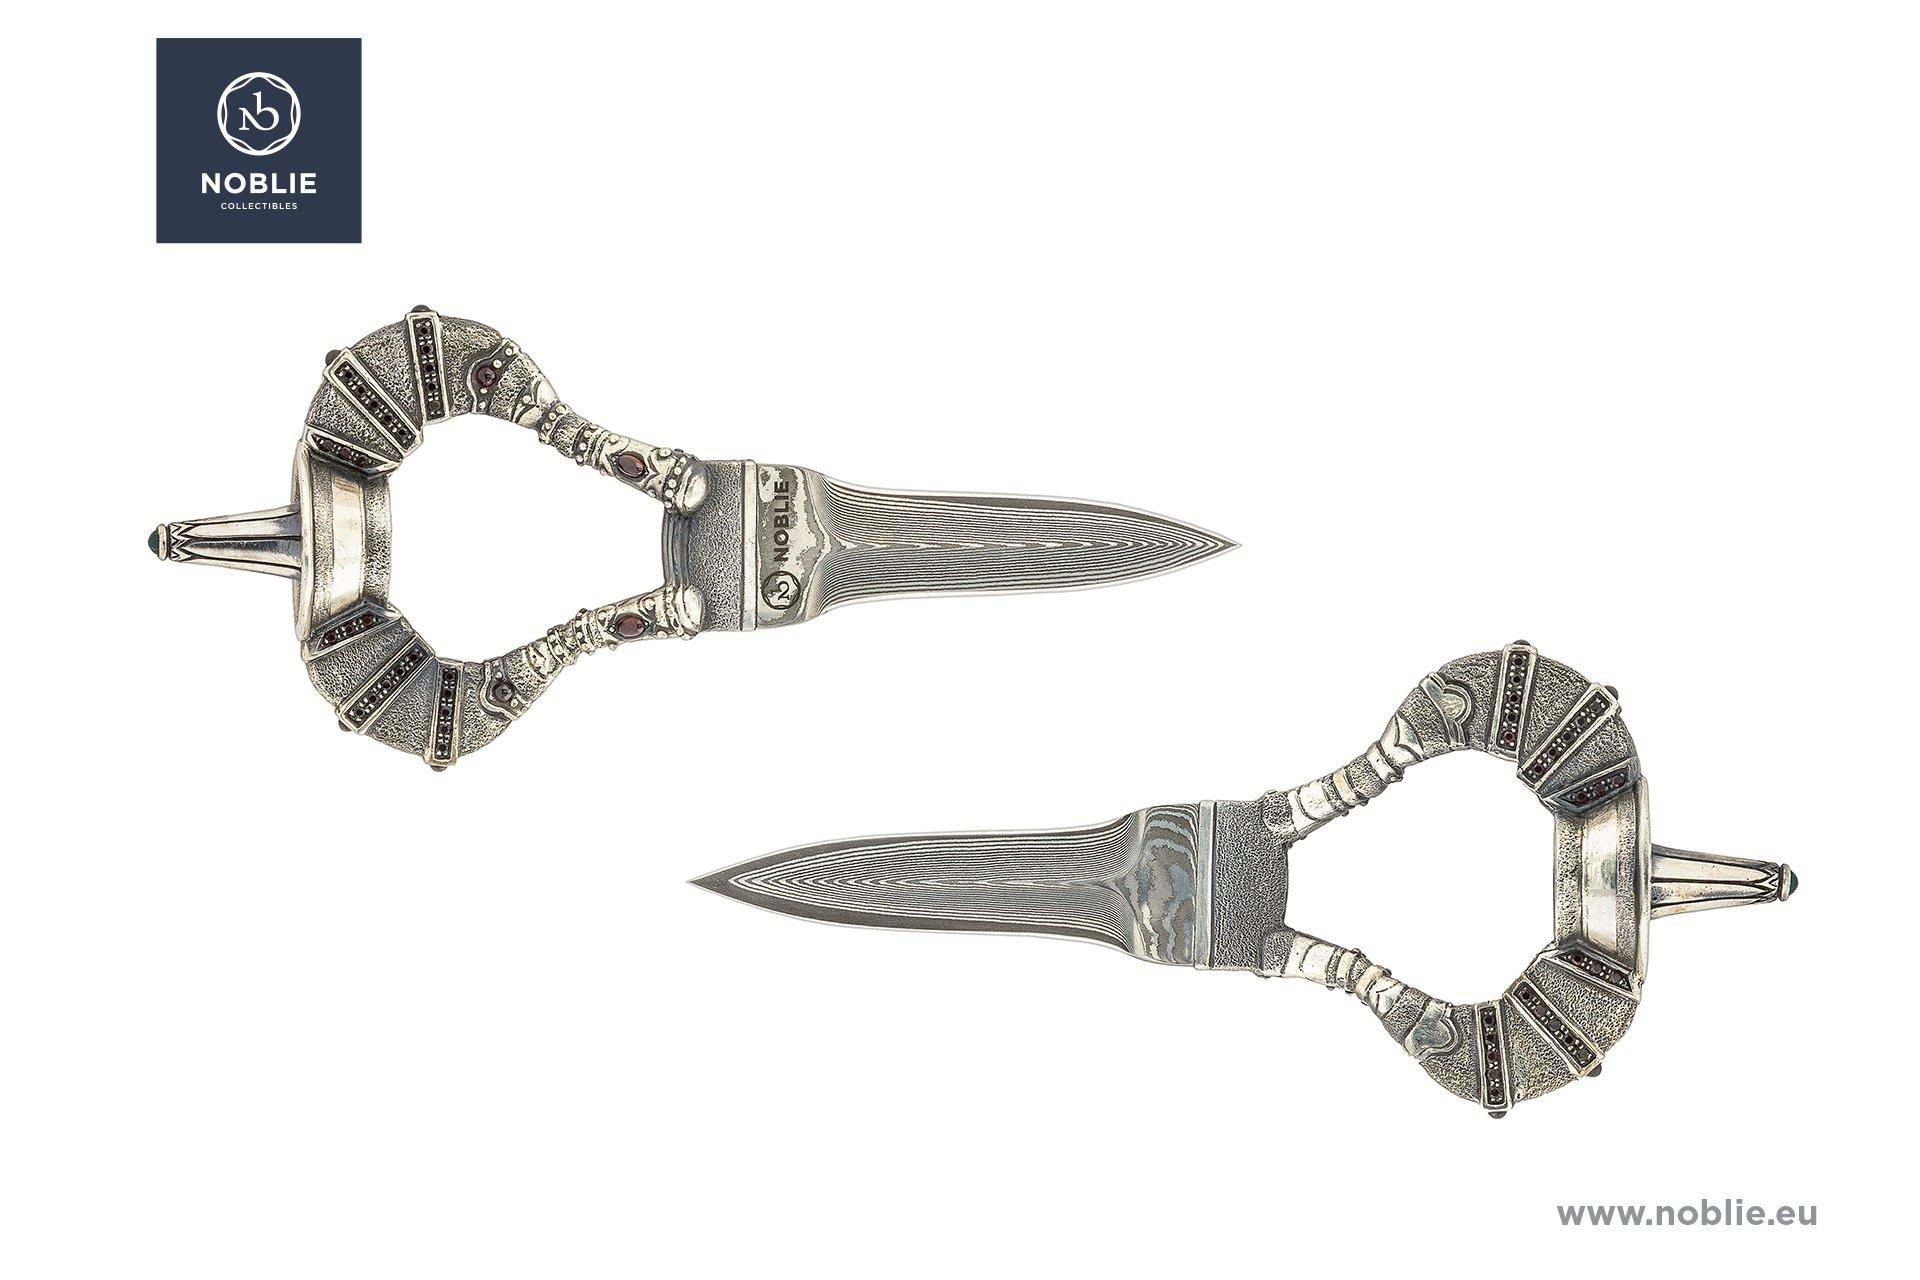 handmade custom knife sculpture